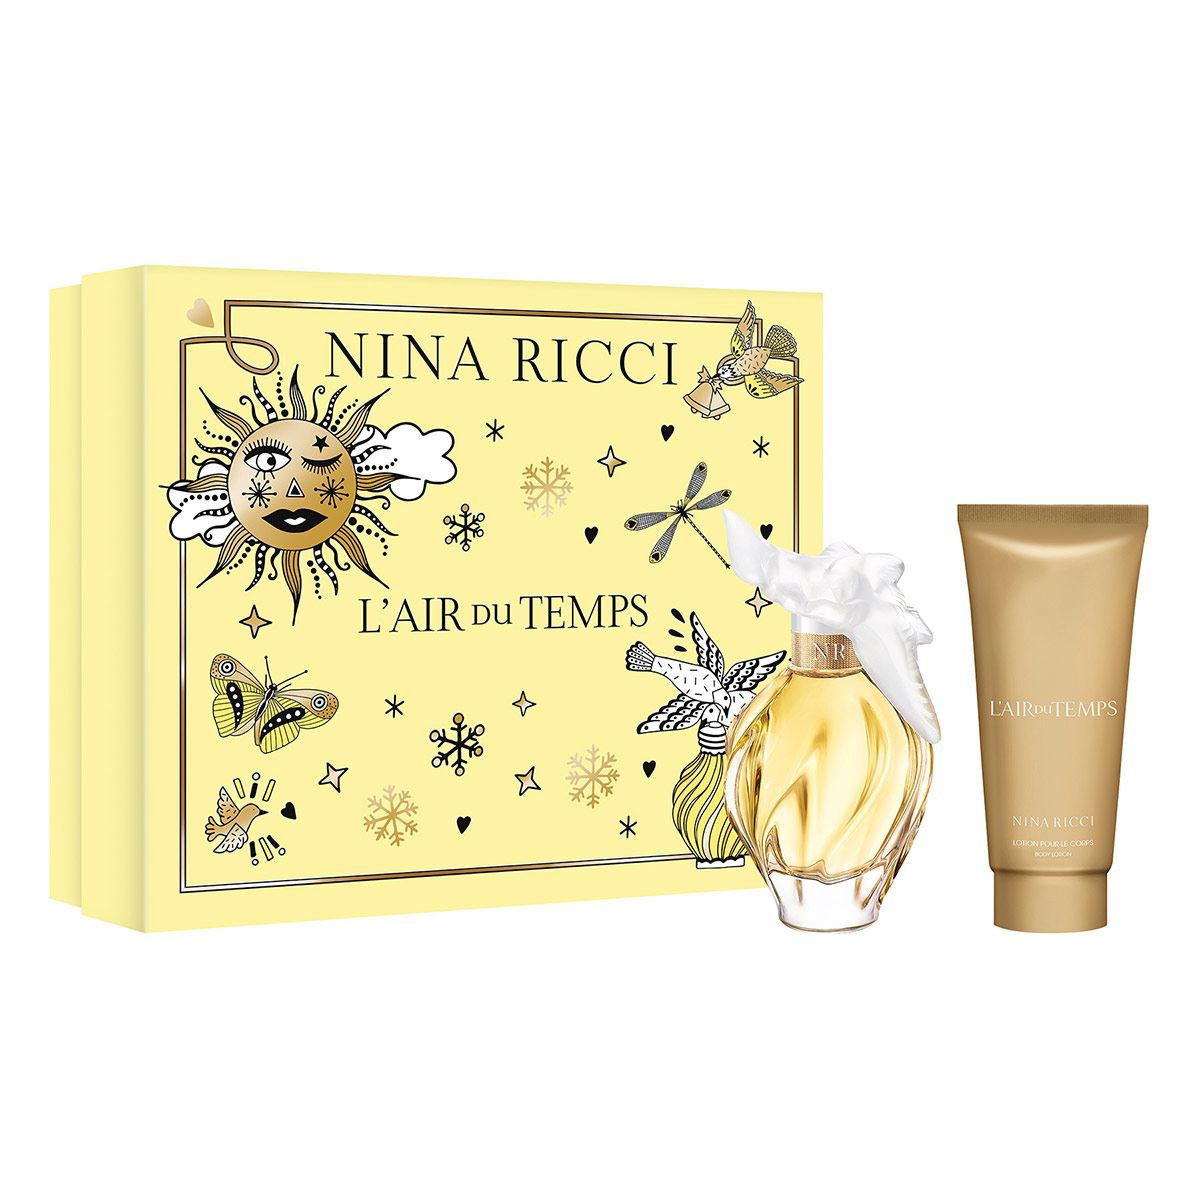 Set para dama, Nina Ricci, Air du temps, EDT 100ML + Body lotion 100ML